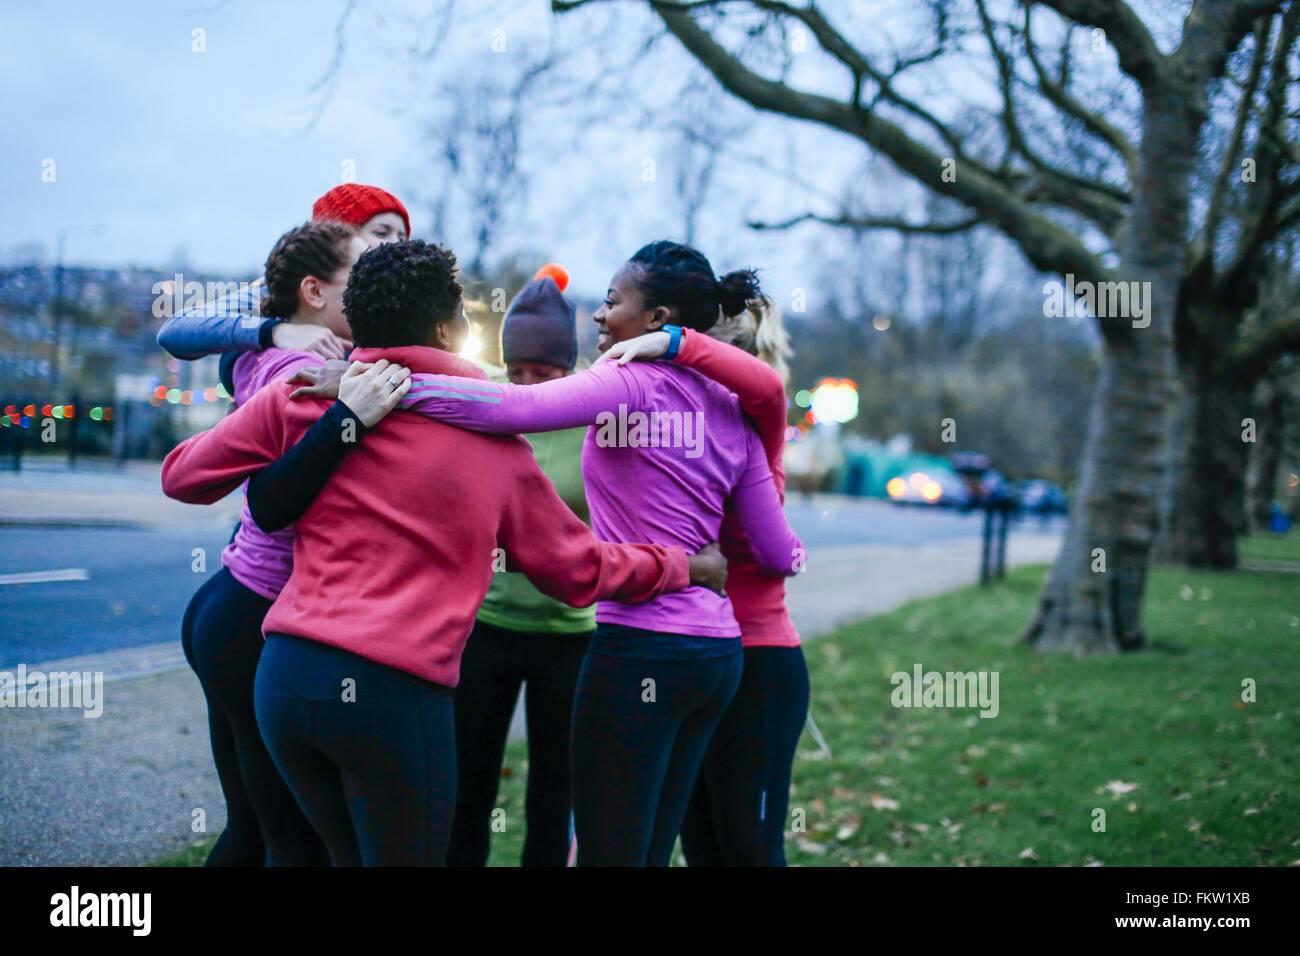 Six female adult runners sharing motivation huddle on city verge at dusk - Stock Image